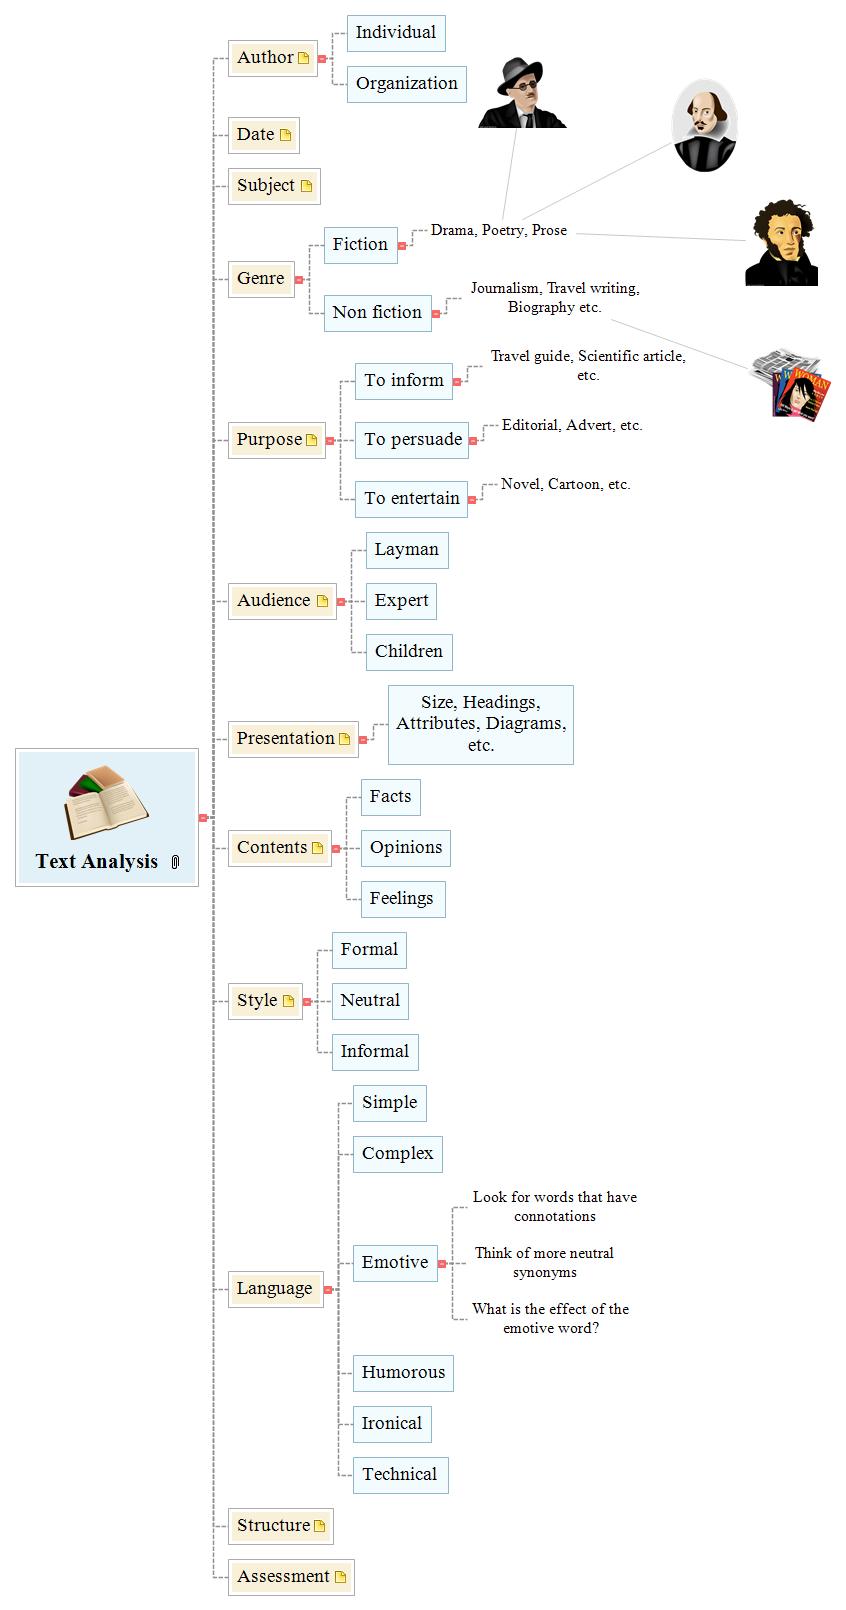 Text Analysis Mind Map